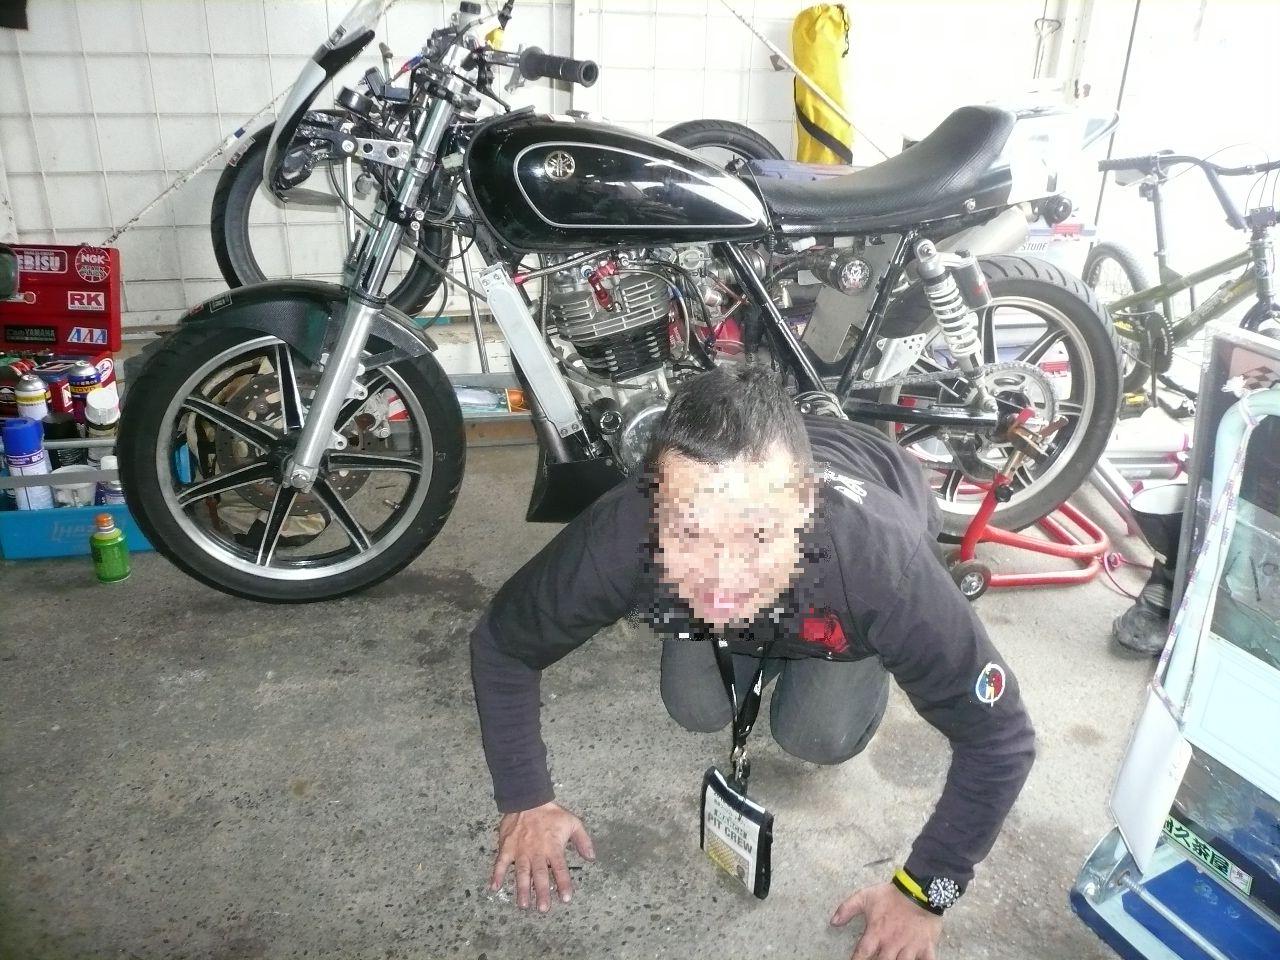 http://img.blogs.yahoo.co.jp/ybi/1/13/f5/tetsutaro499/folder/420377/img_420377_49943084_4?1267926687